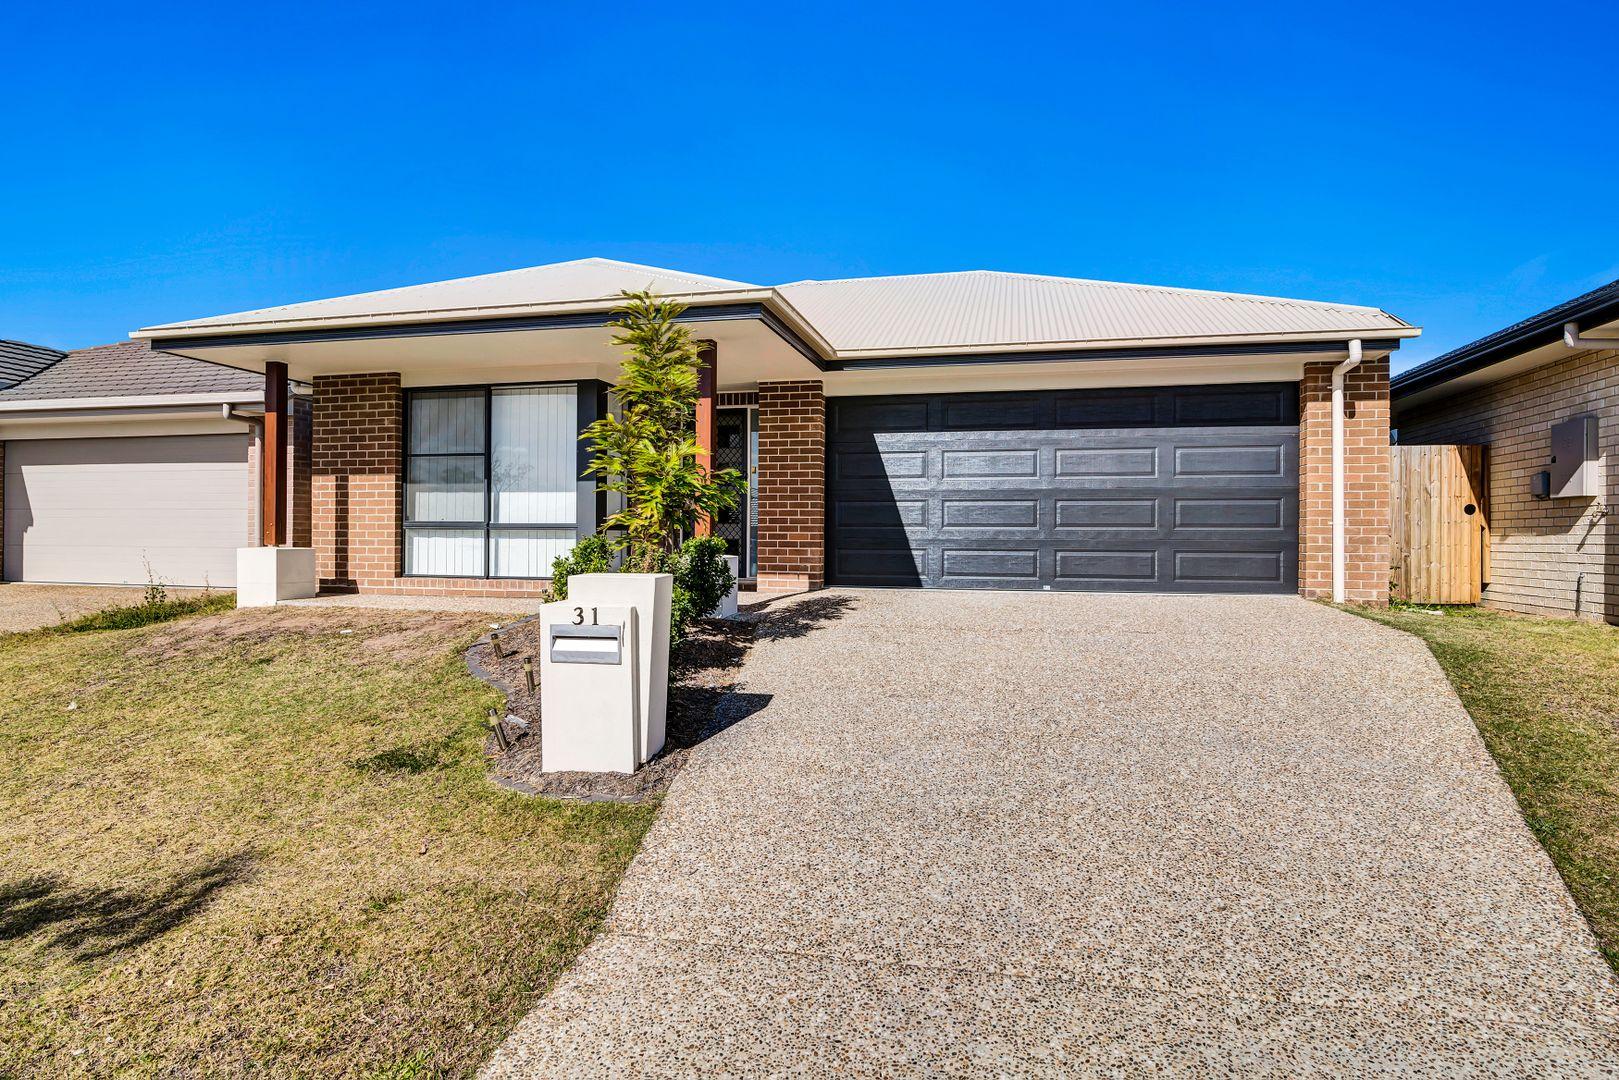 31 Lamont Street, Coomera QLD 4209, Image 0